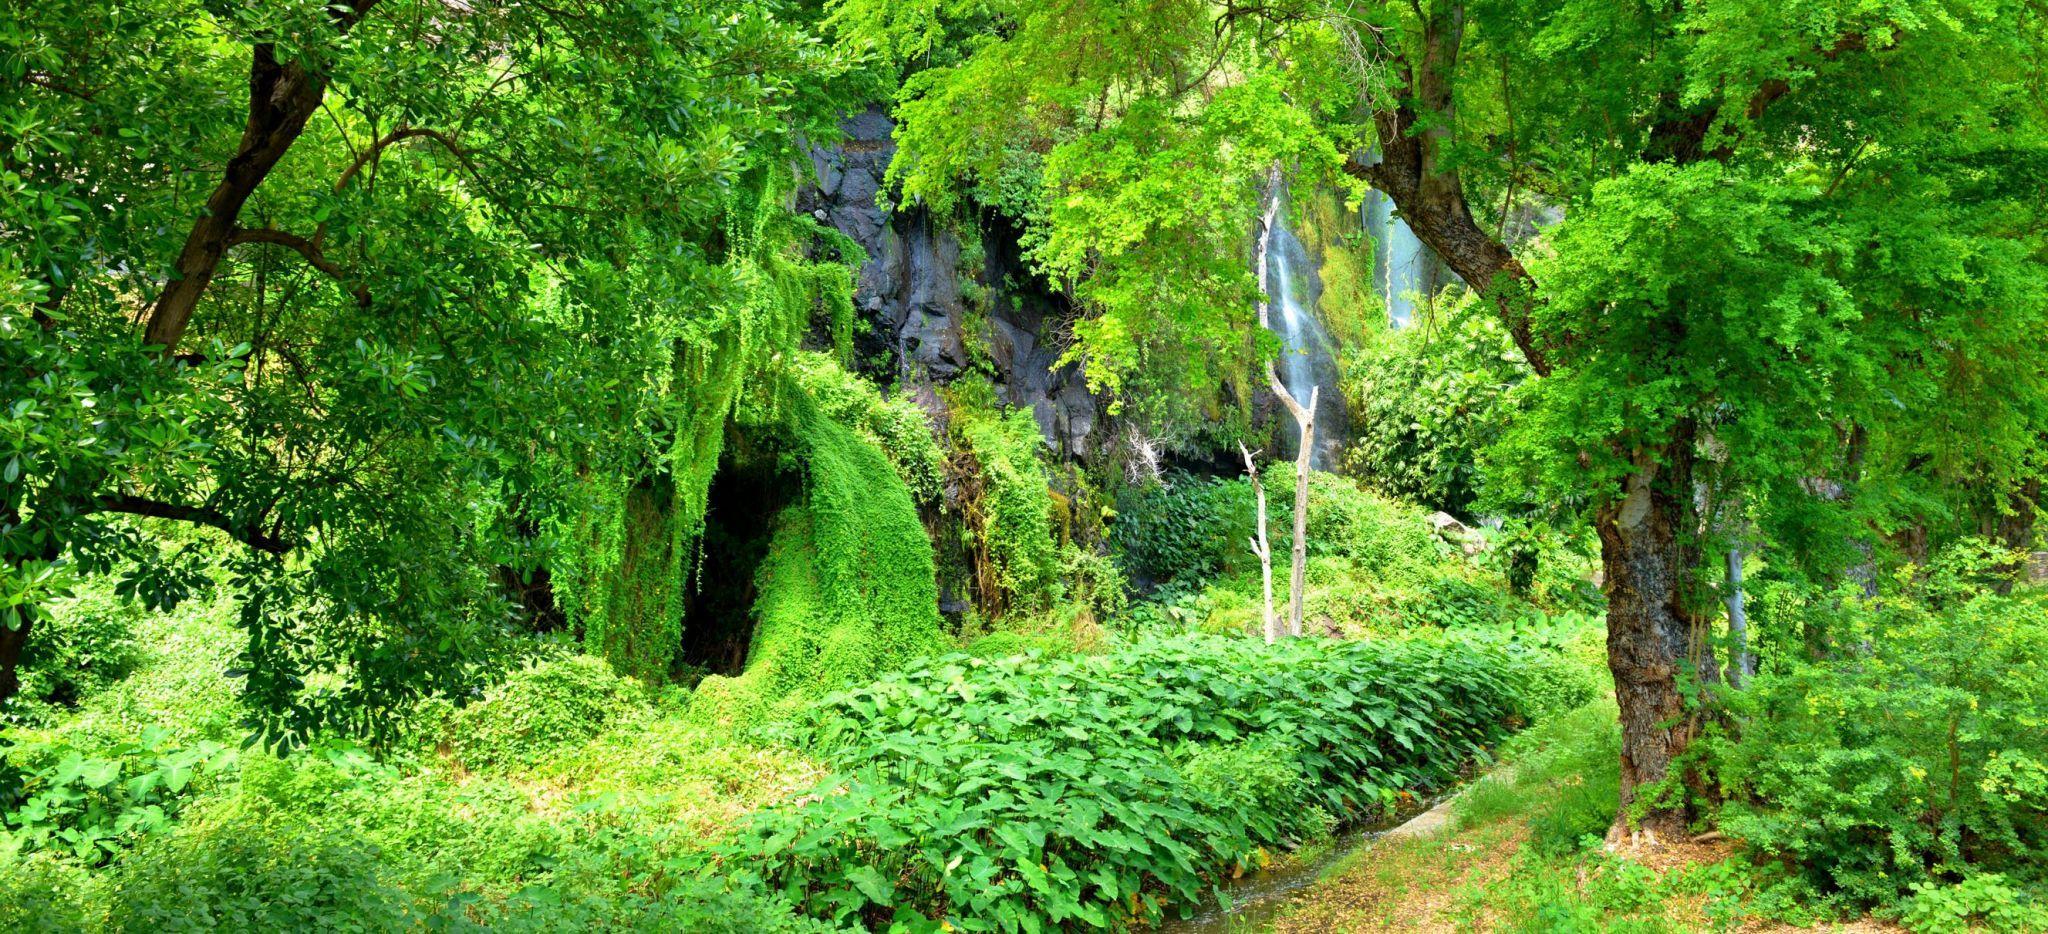 Der Dschungel rund um die Grotte des premiers francais auf der Insel la Réunion